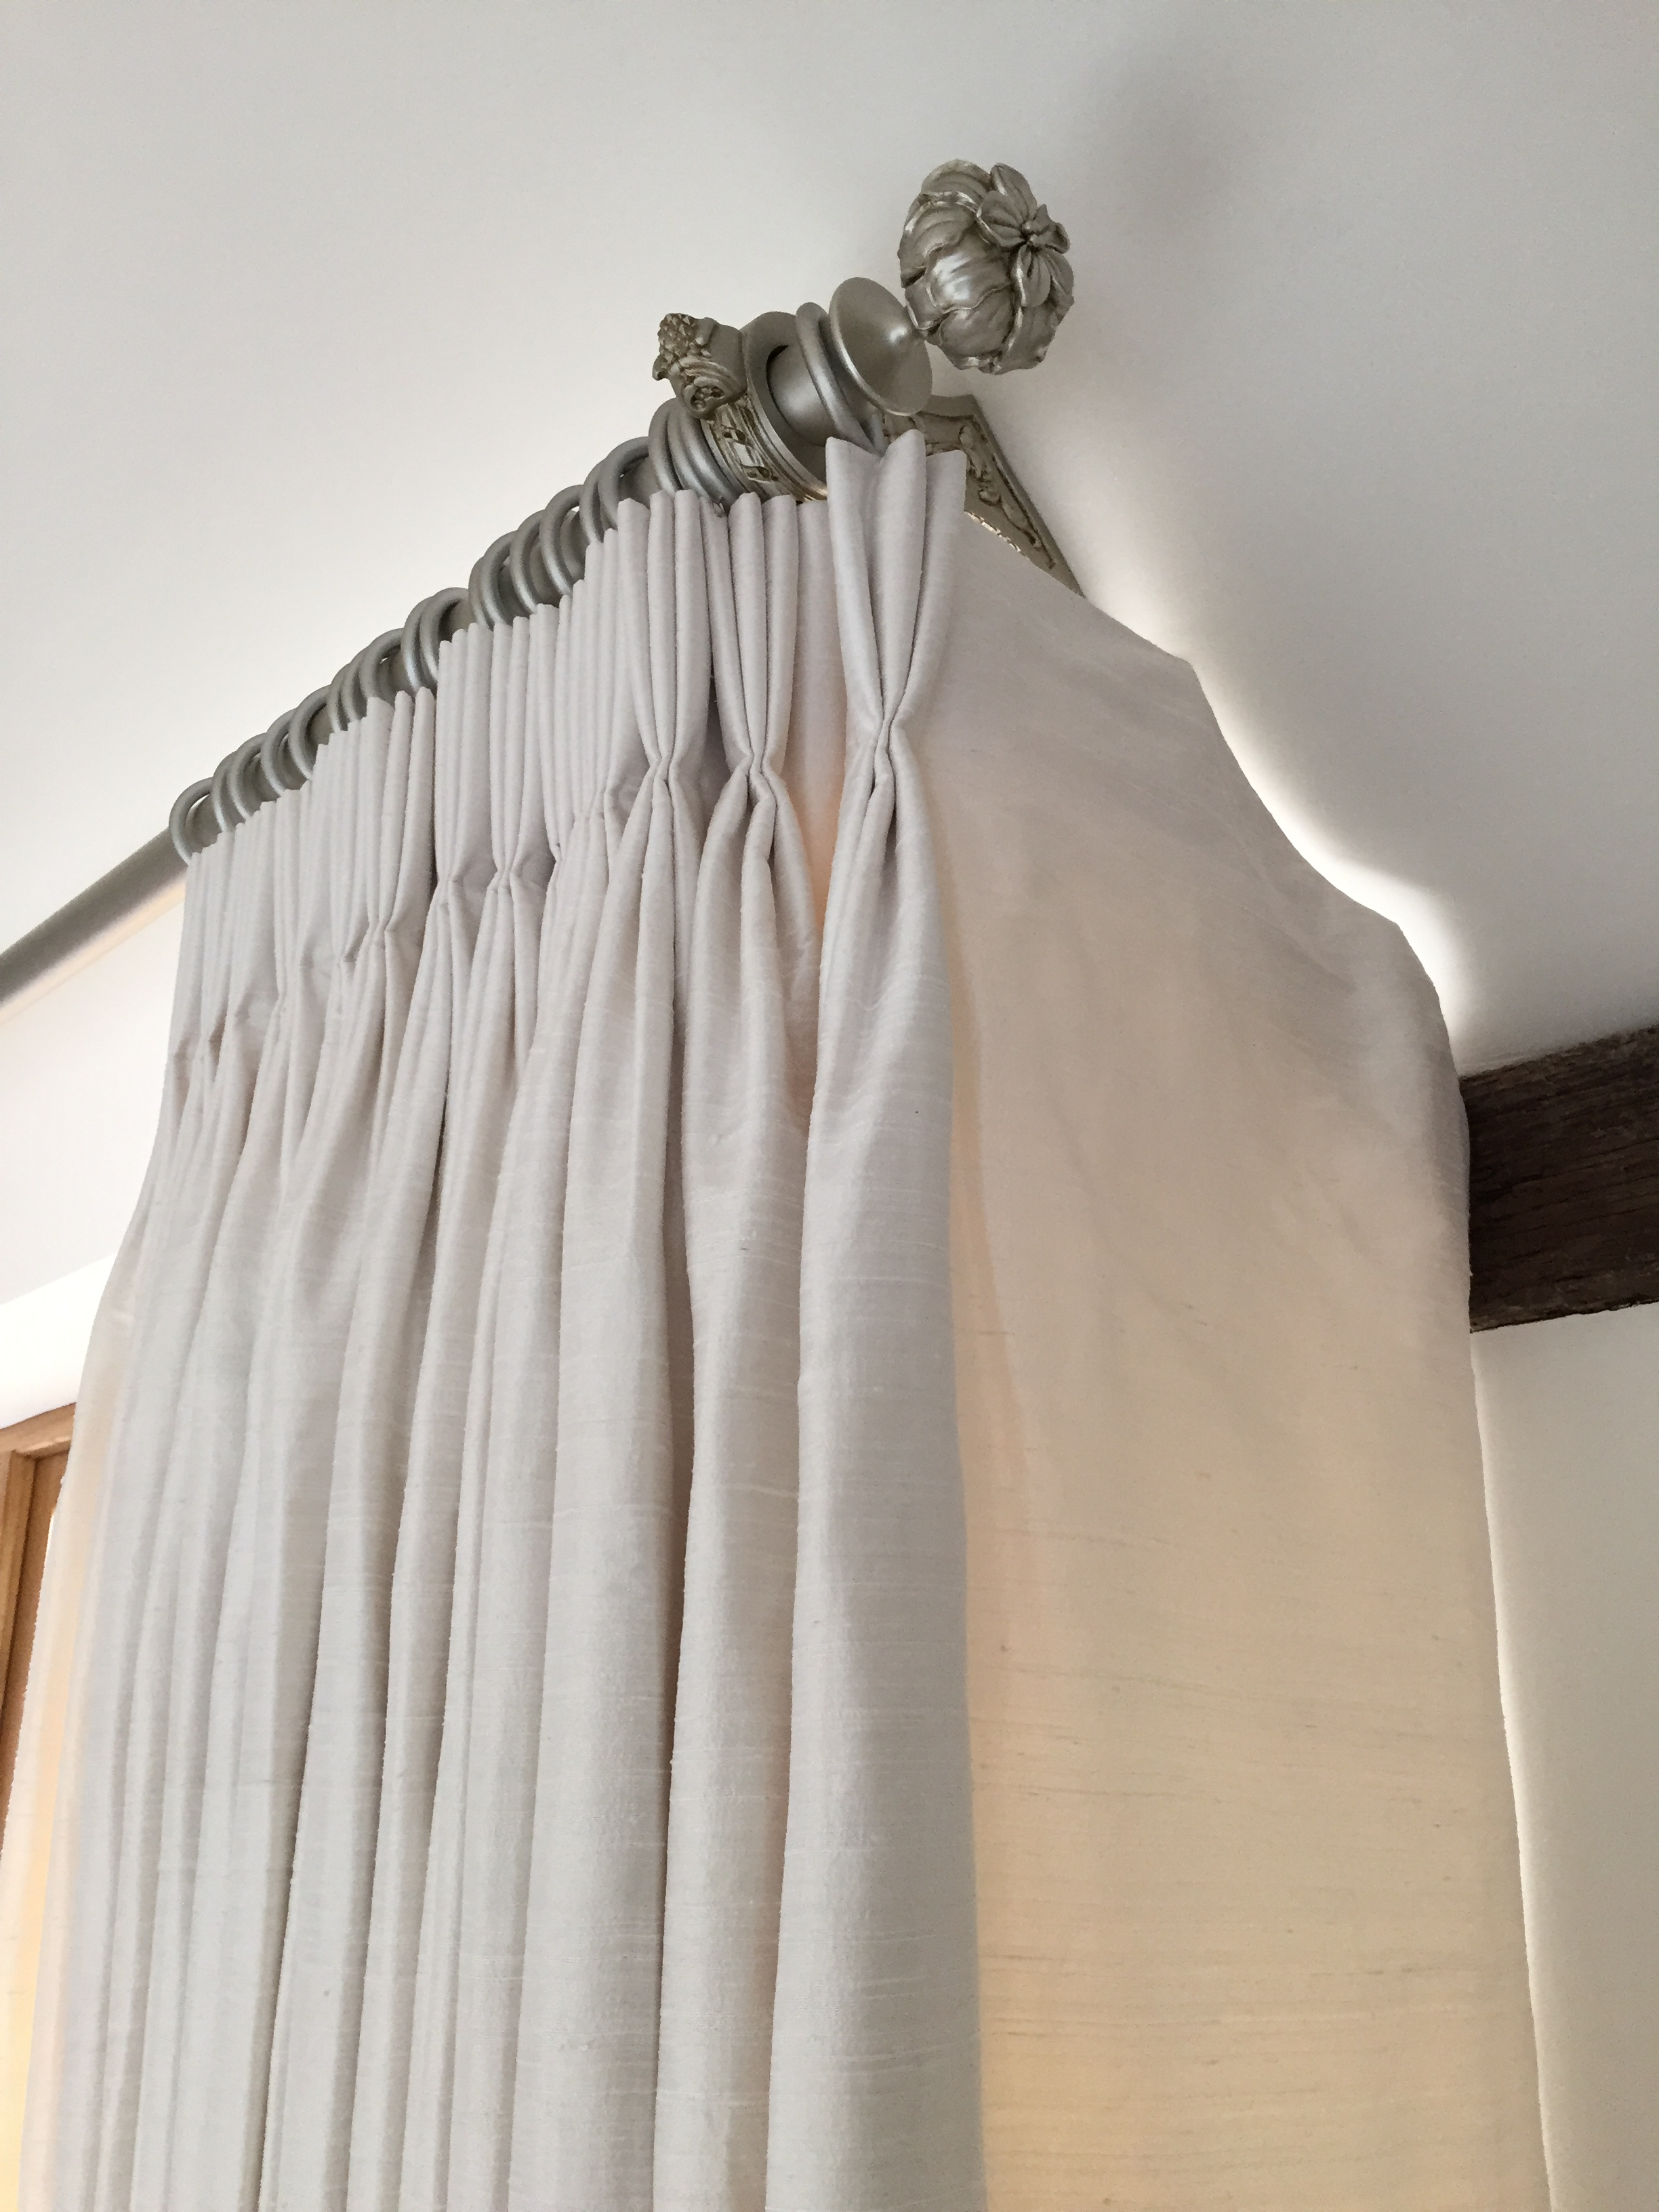 Triple pleat interlined curtains.